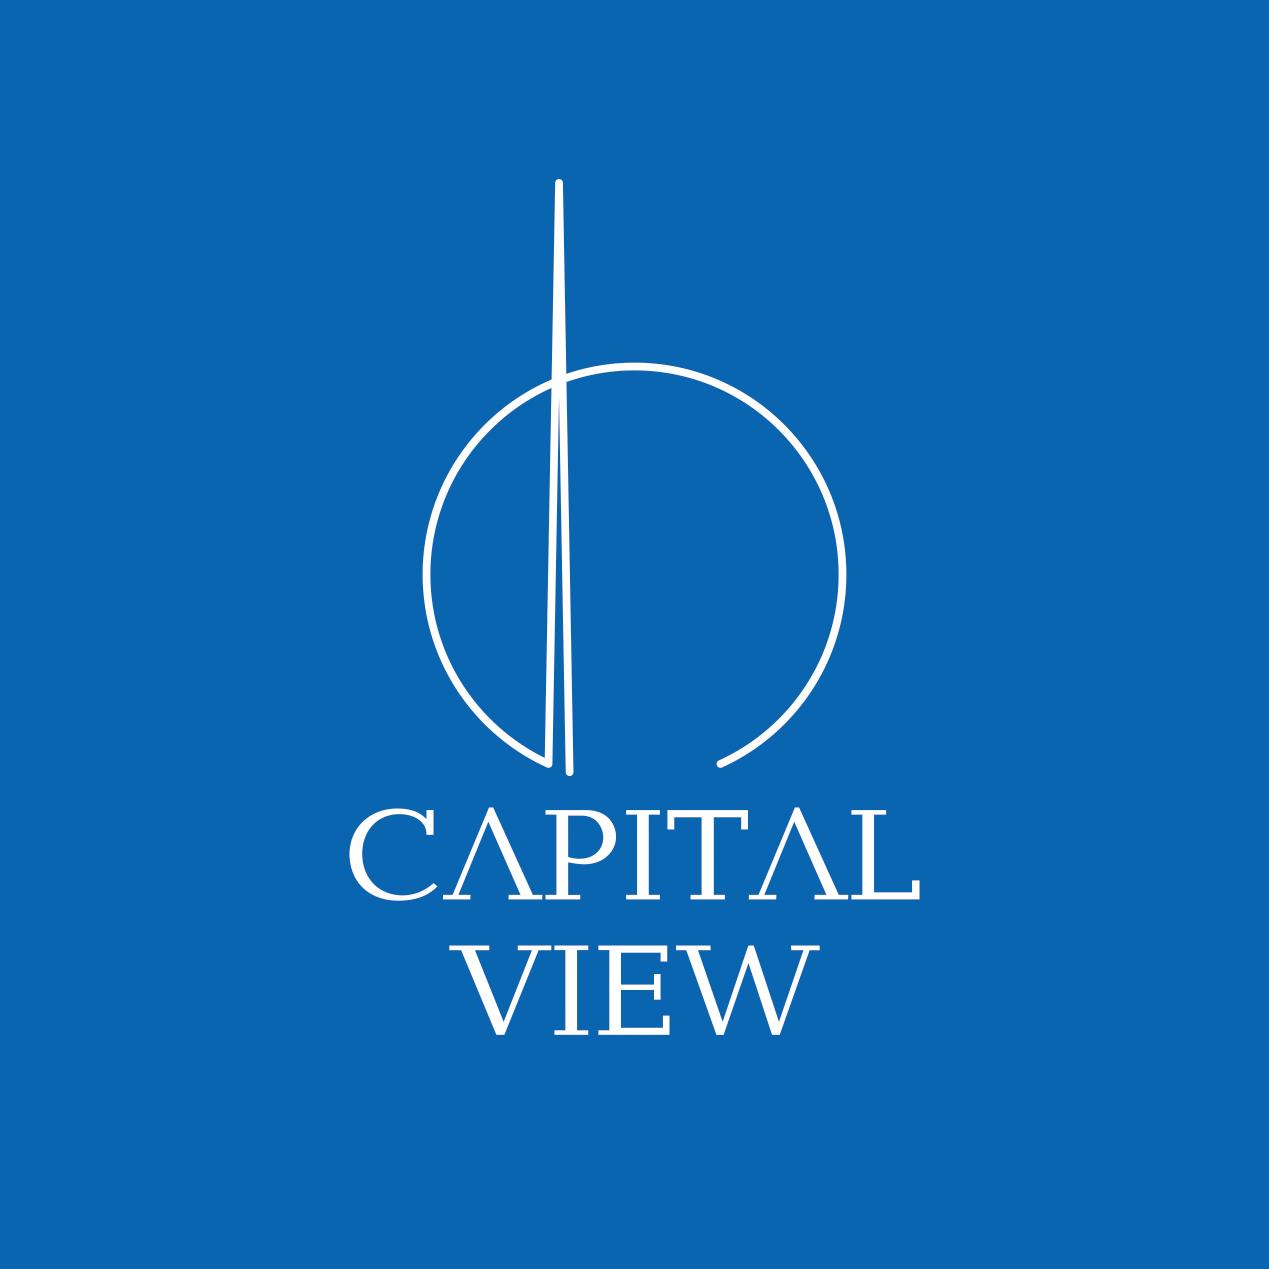 CAPITAL VIEW фото f_4fd9ea73d06be.jpg